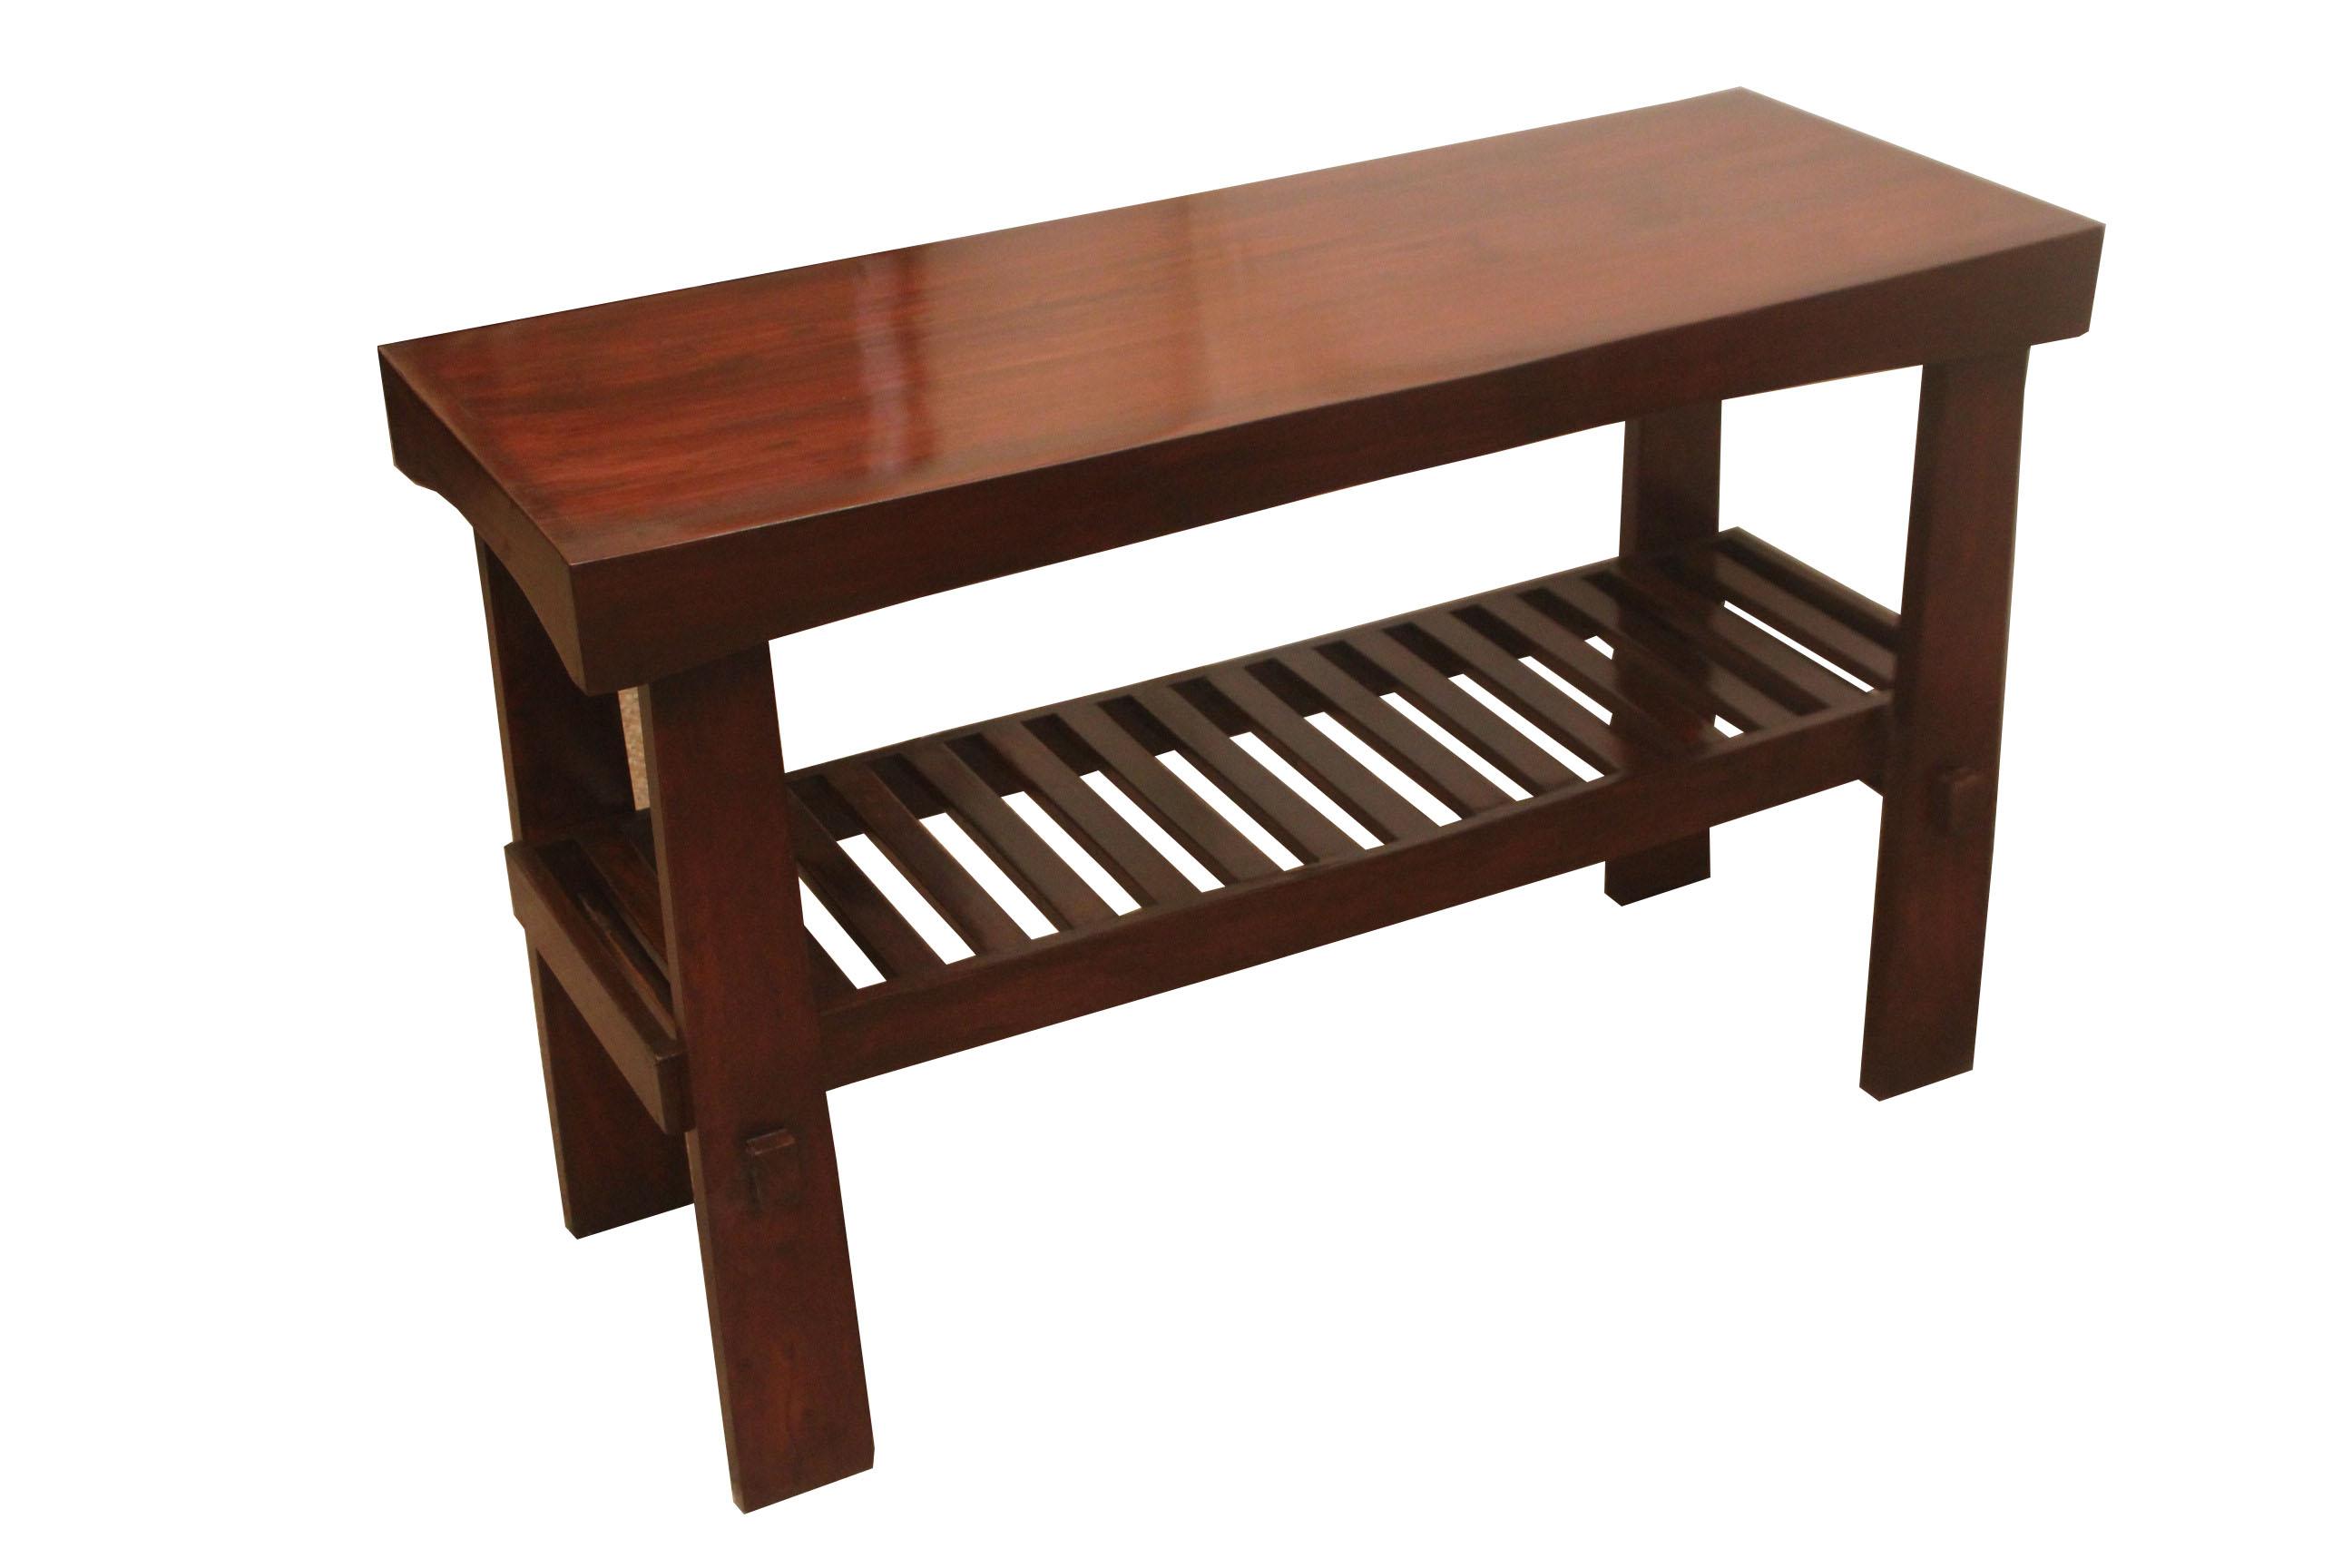 Buy Indian Furniture Brand Writing Tables in Mumbai